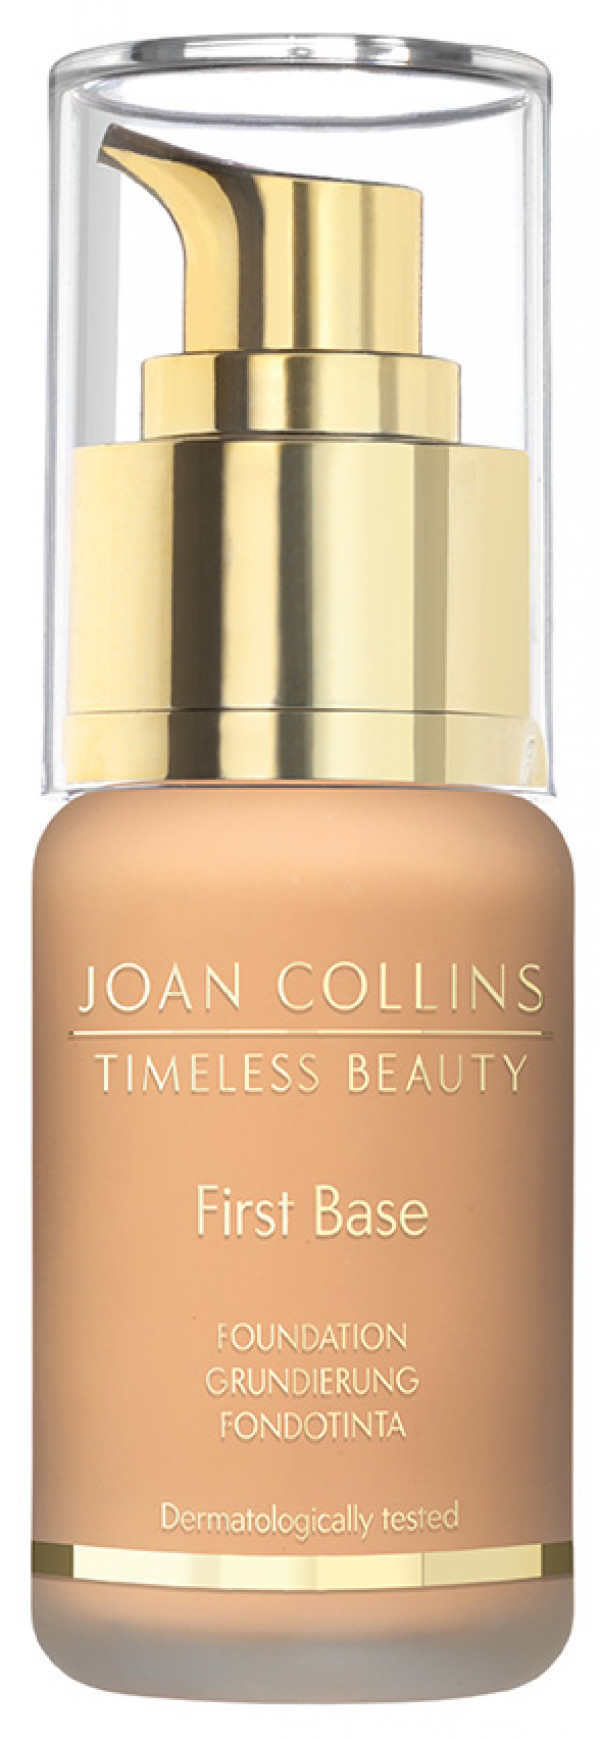 Joan Collins First Base Foundation, warm dark